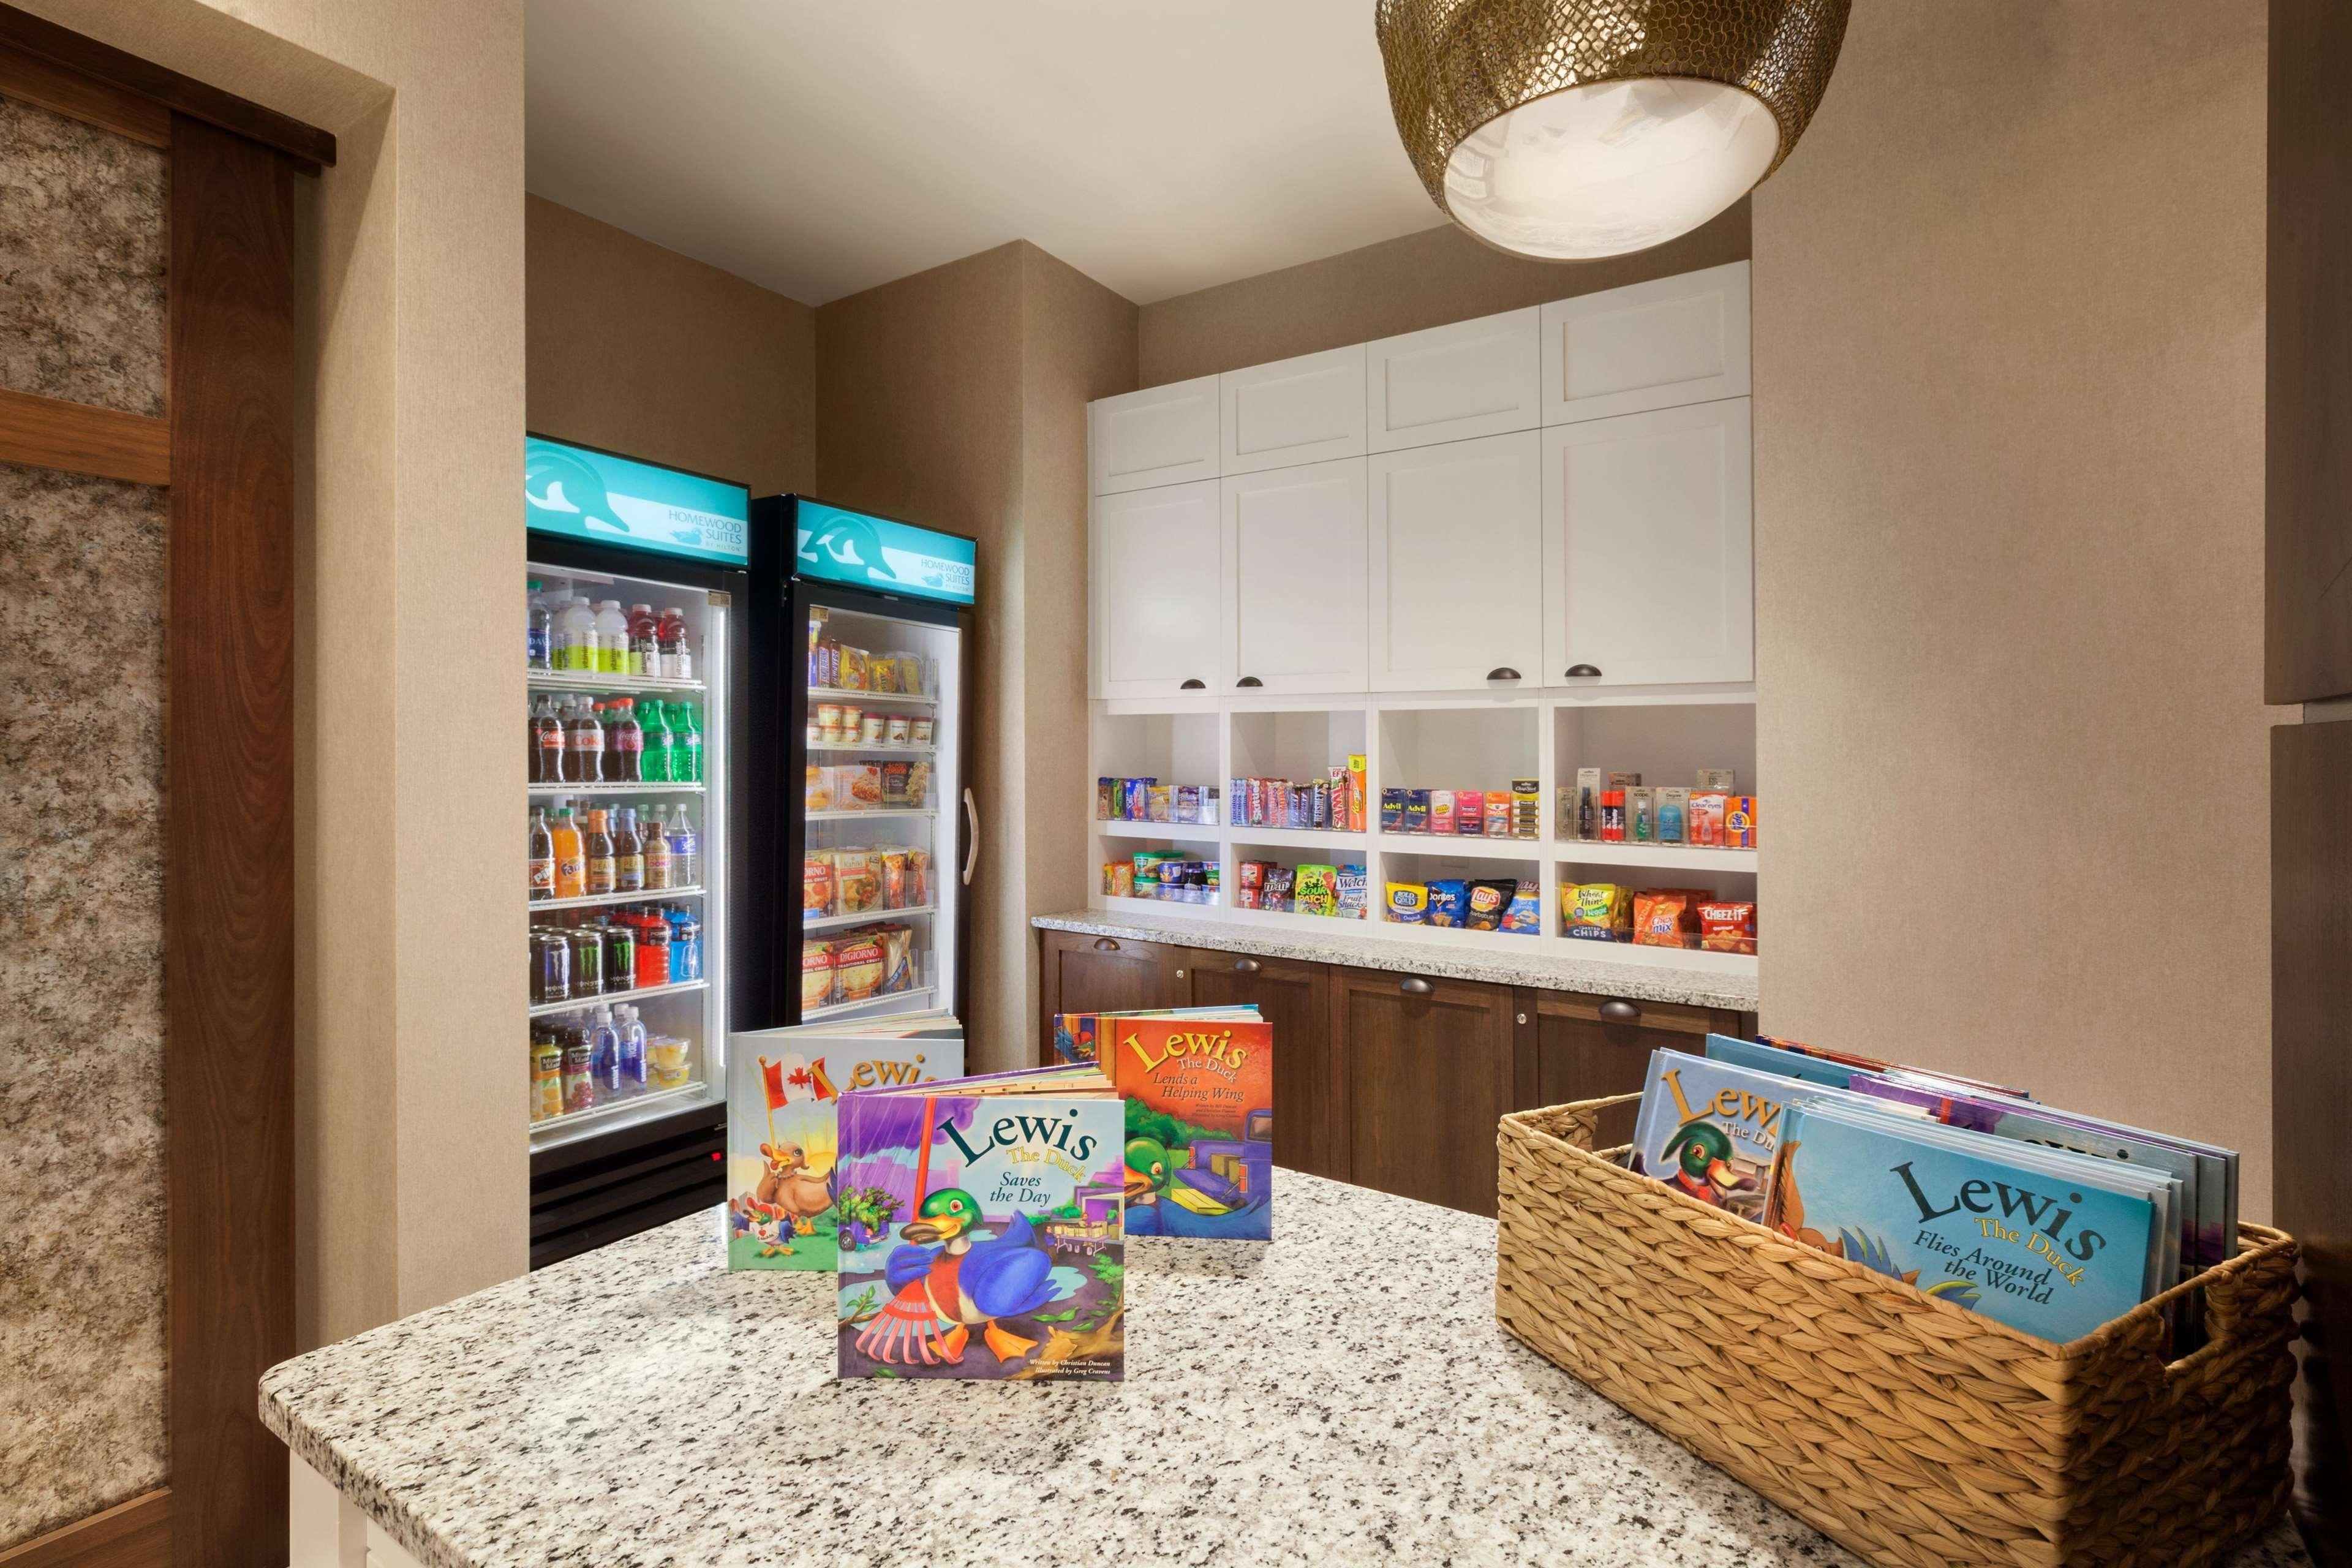 Homewood Suites by Hilton Charlotte/SouthPark image 9